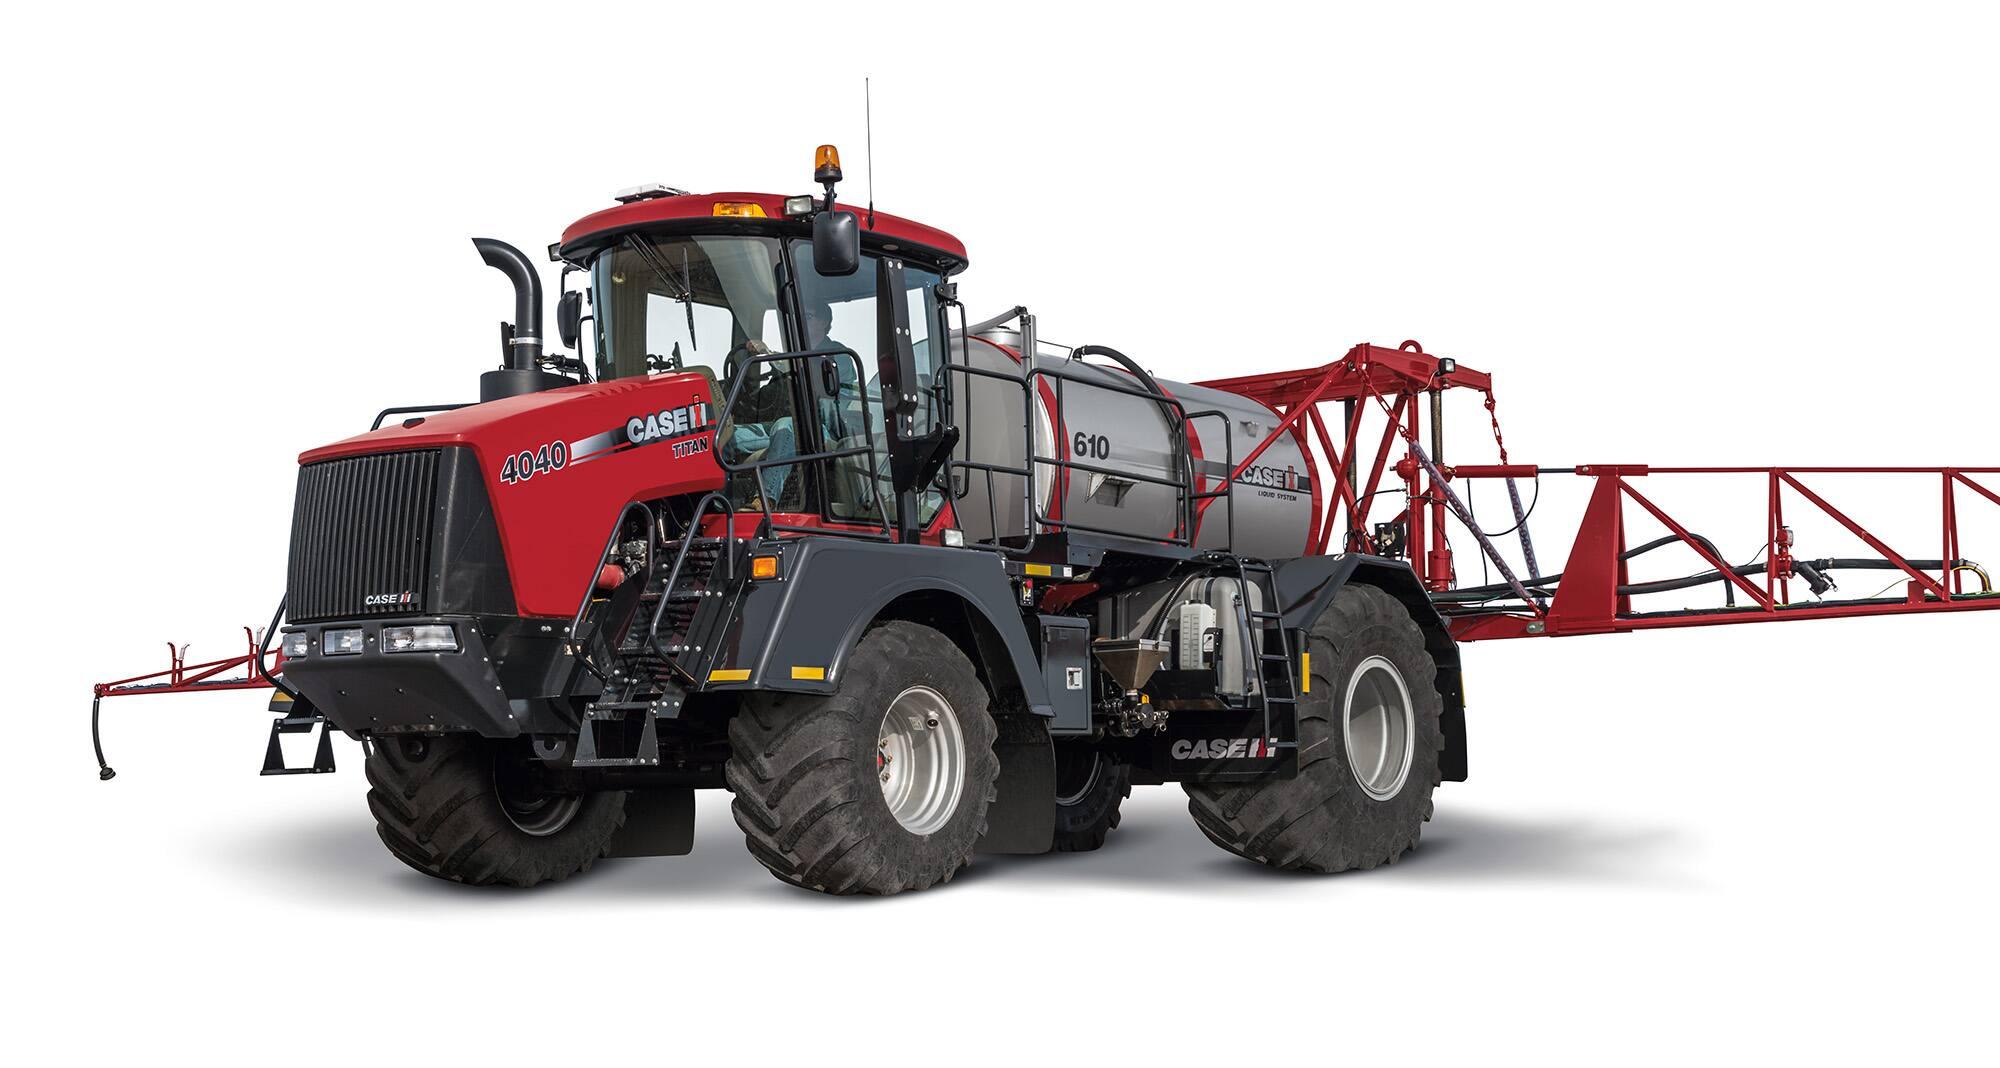 hight resolution of titan 4040 floater fertilizer application equipment case ih rh caseih com chevy fan belt diagrams chevrolet